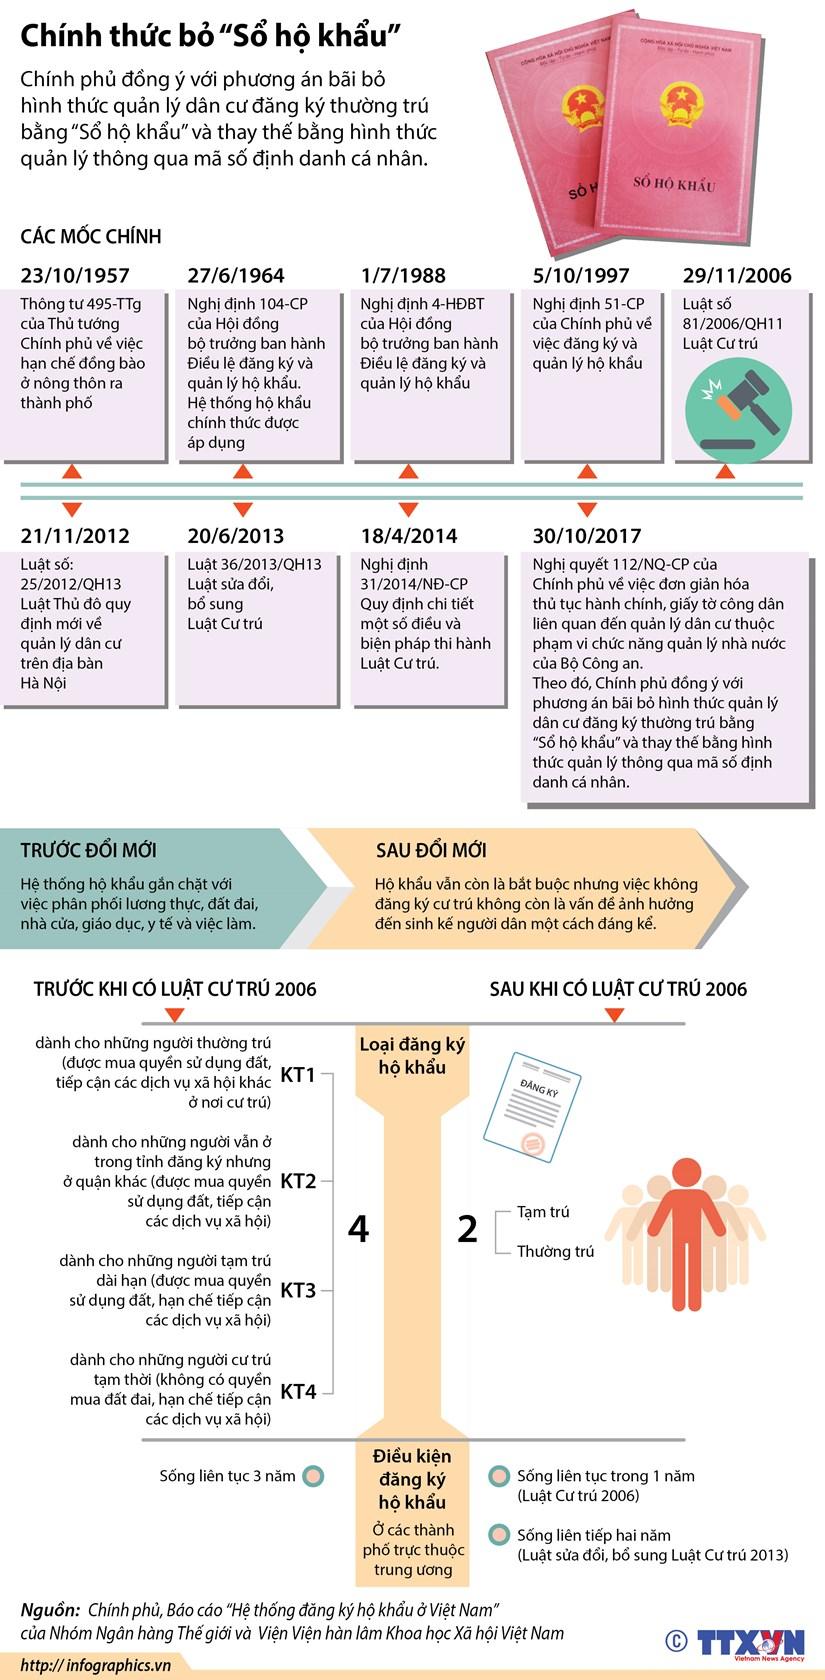 [Infographics] Chinh thuc bo hinh thuc quan ly bang so ho khau hinh anh 1